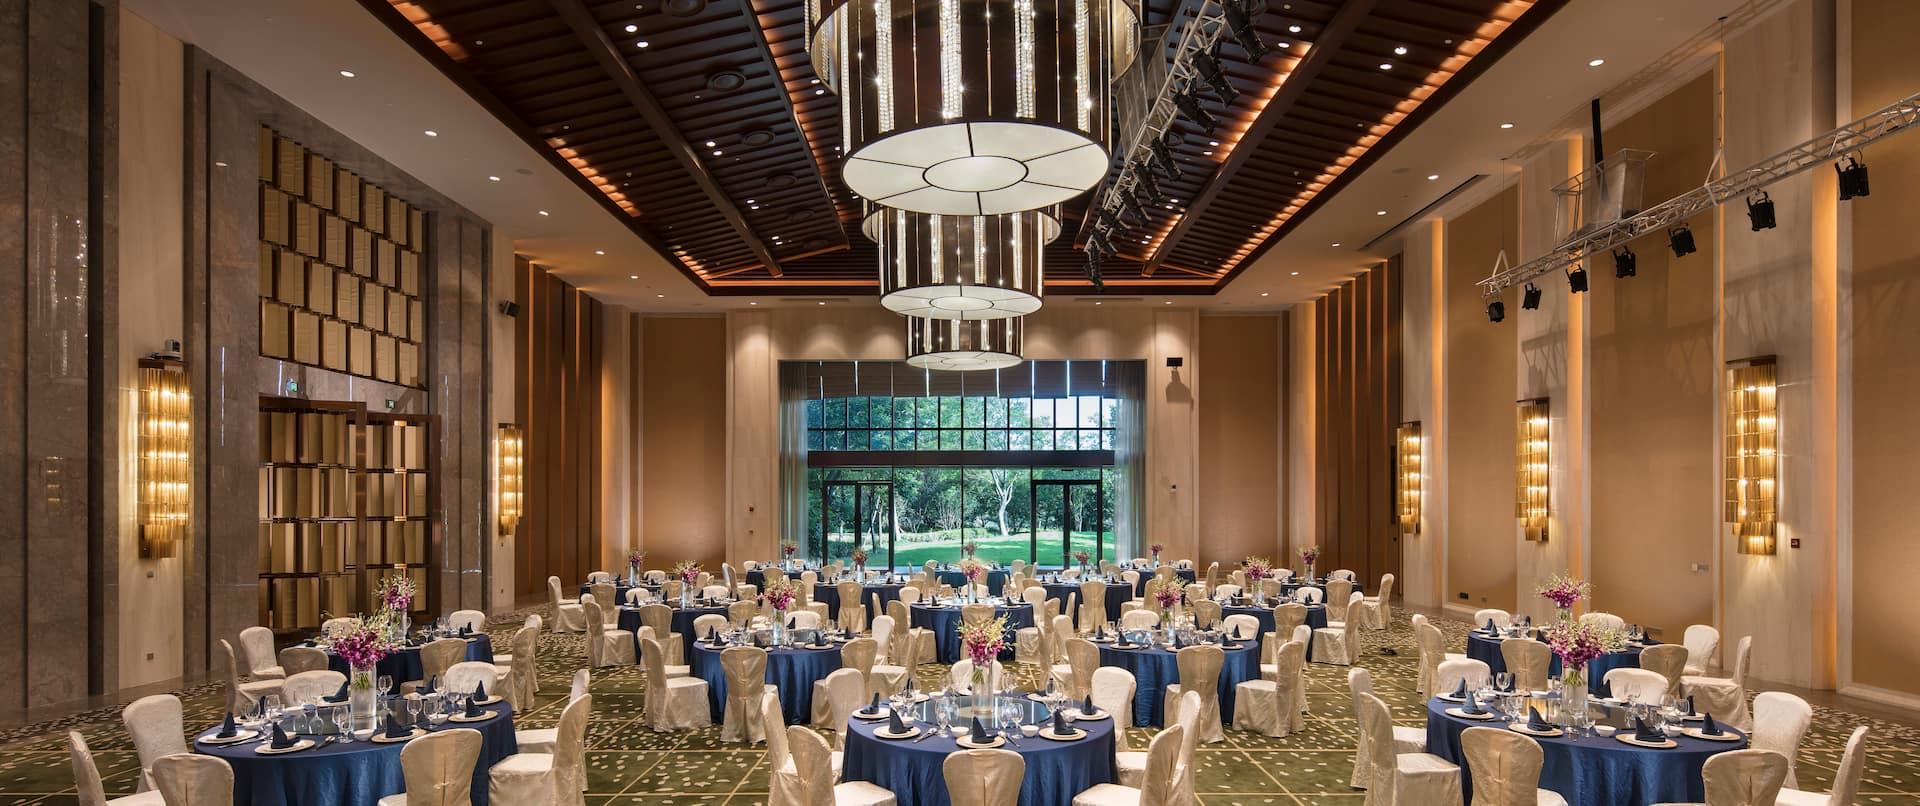 Event Setup In Ballroom